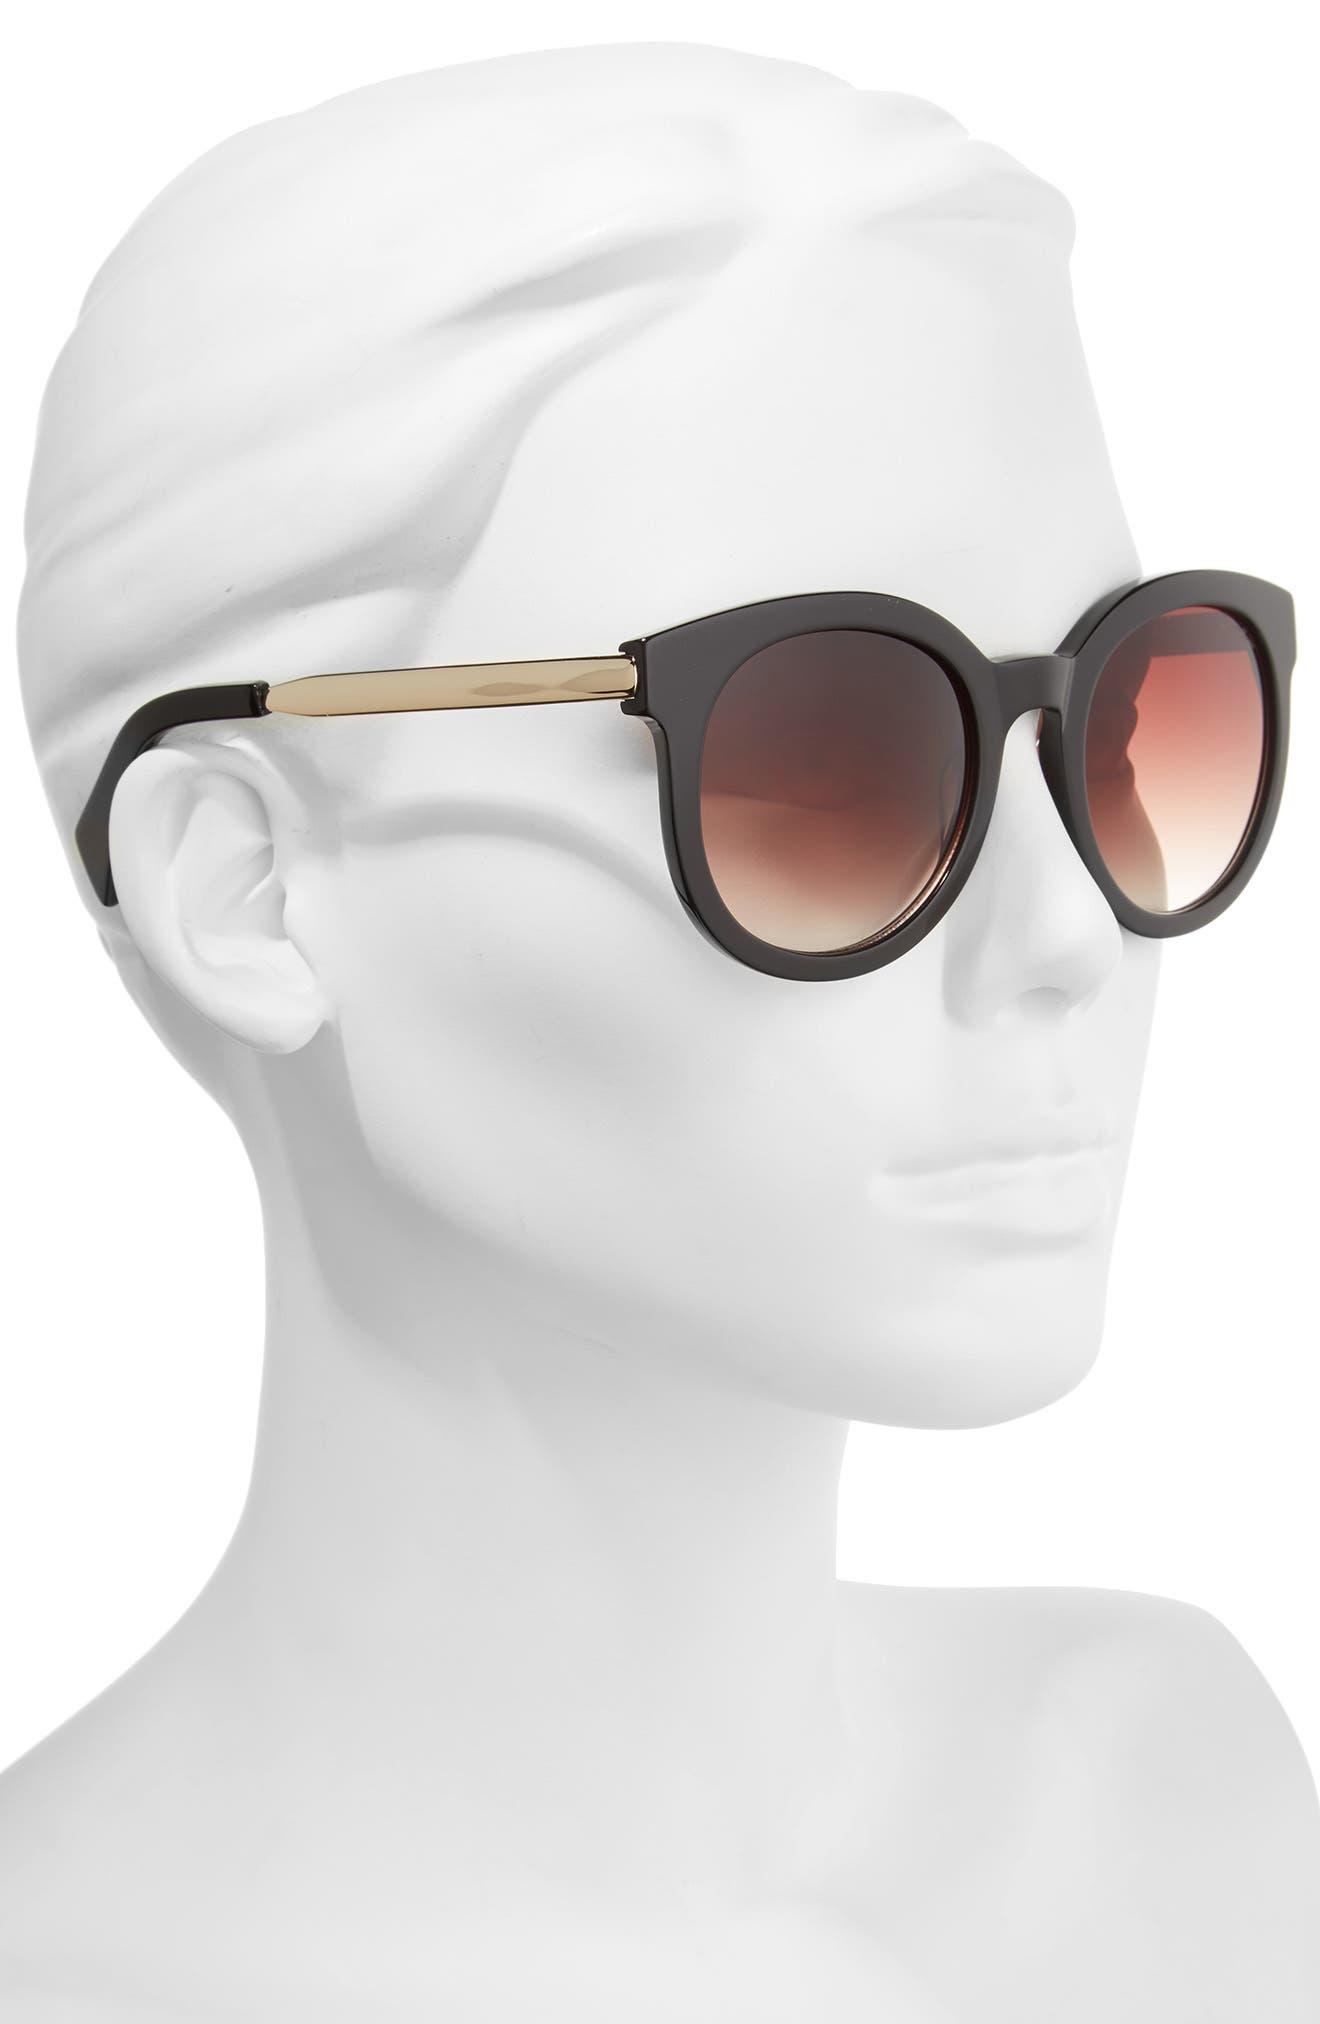 53mm Gradient Lens Round Sunglasses,                             Alternate thumbnail 2, color,                             001